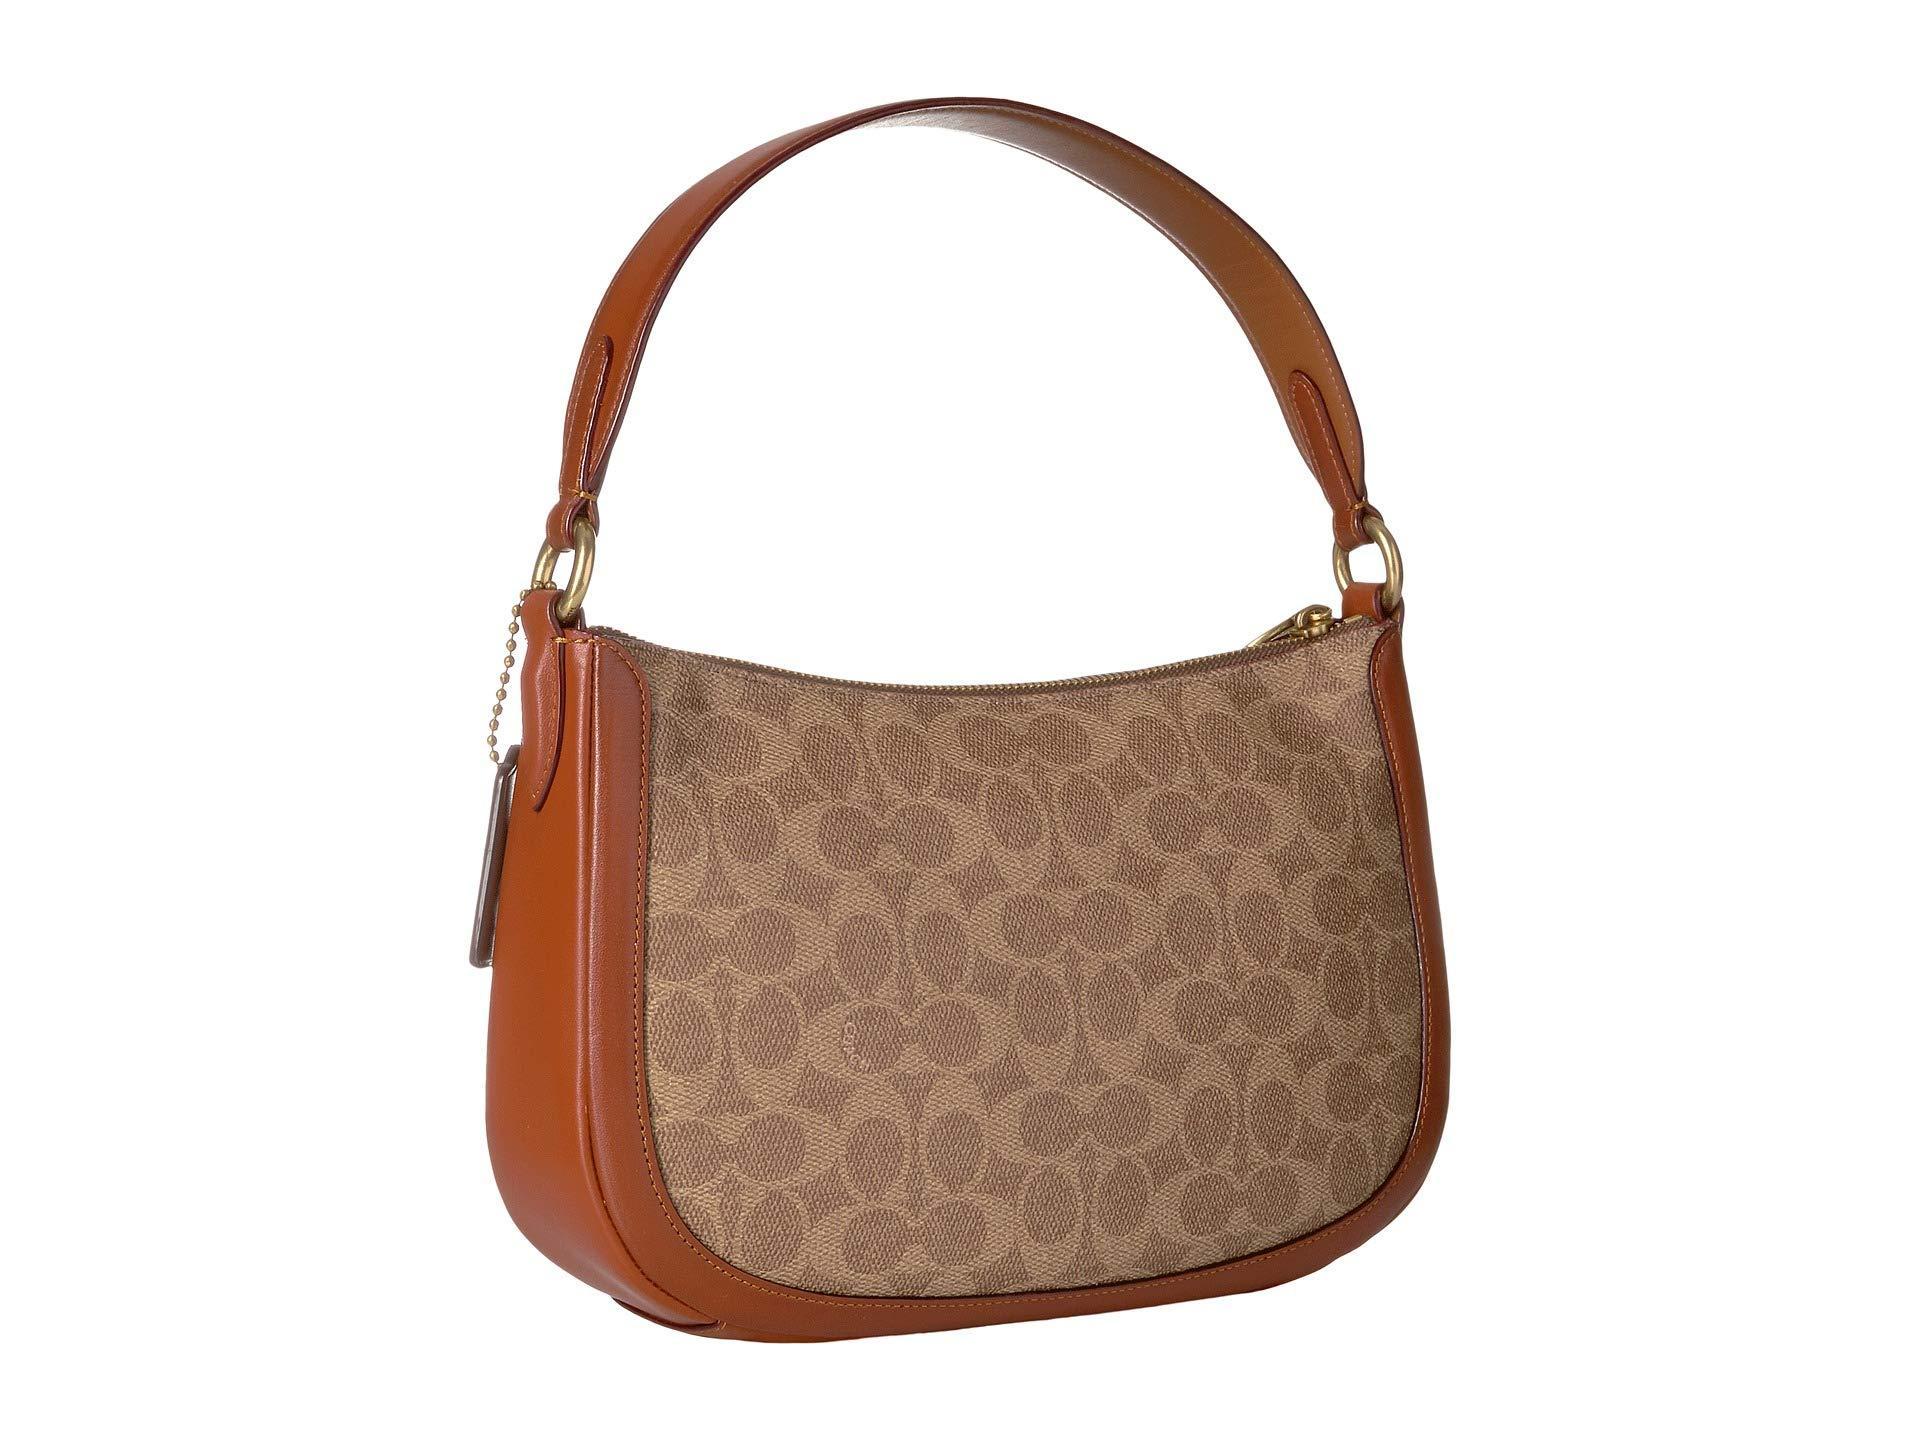 COACH - Brown Coated Canvas Signatures Sutton Crossbody (tan rust brass)  Handbags. View fullscreen a1f499fcdeacb